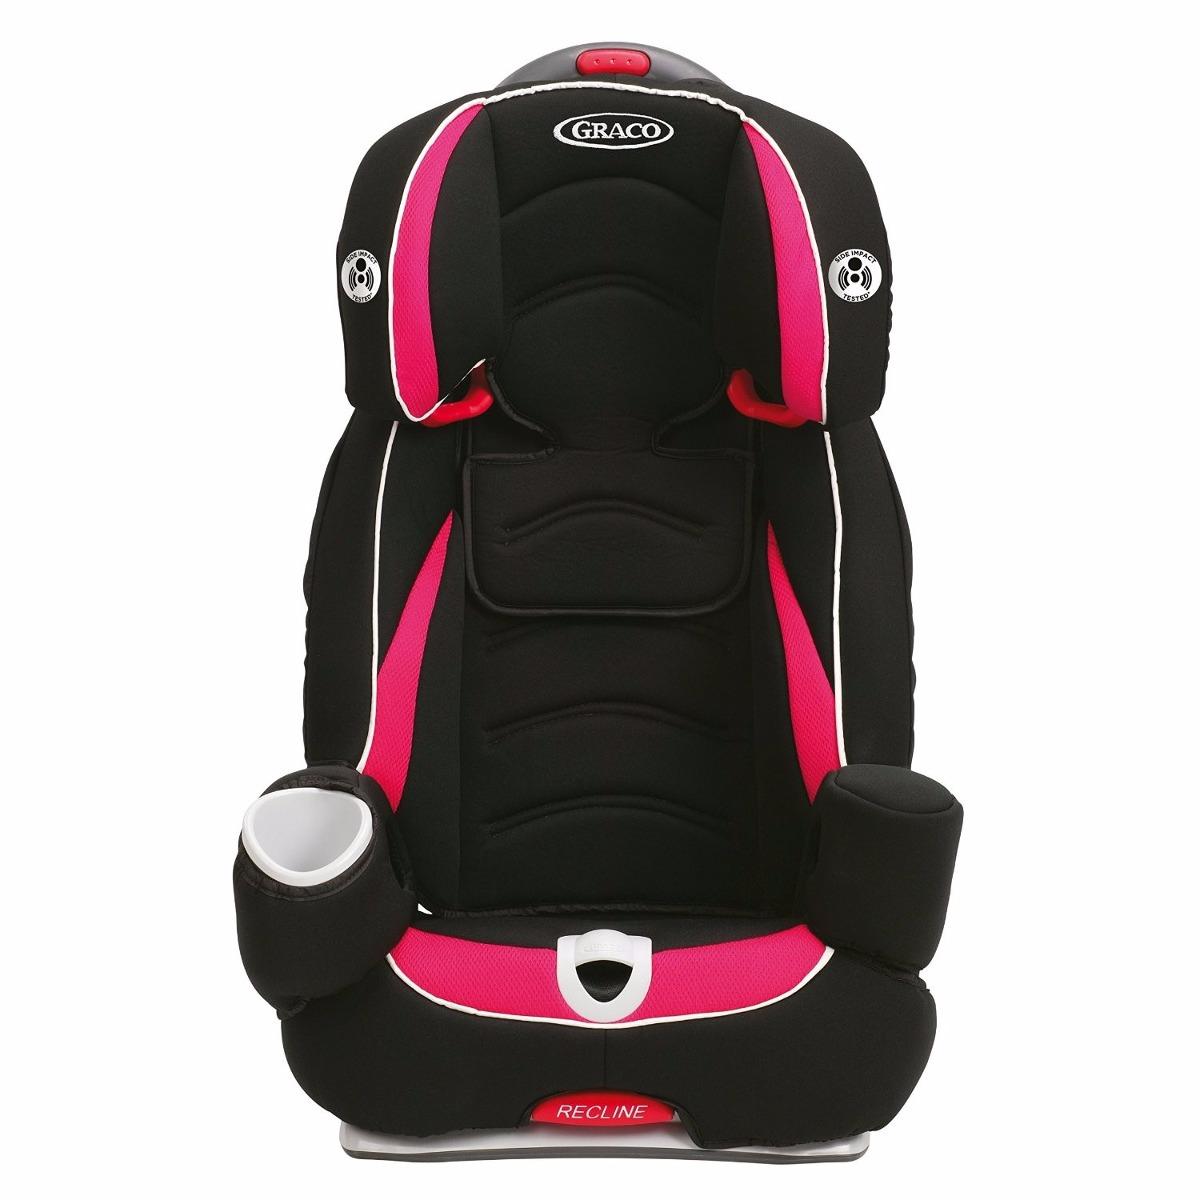 Graco argos 80 elite azalea silla carro bebe ni o 3 en 1 Sillas de carro para ninos